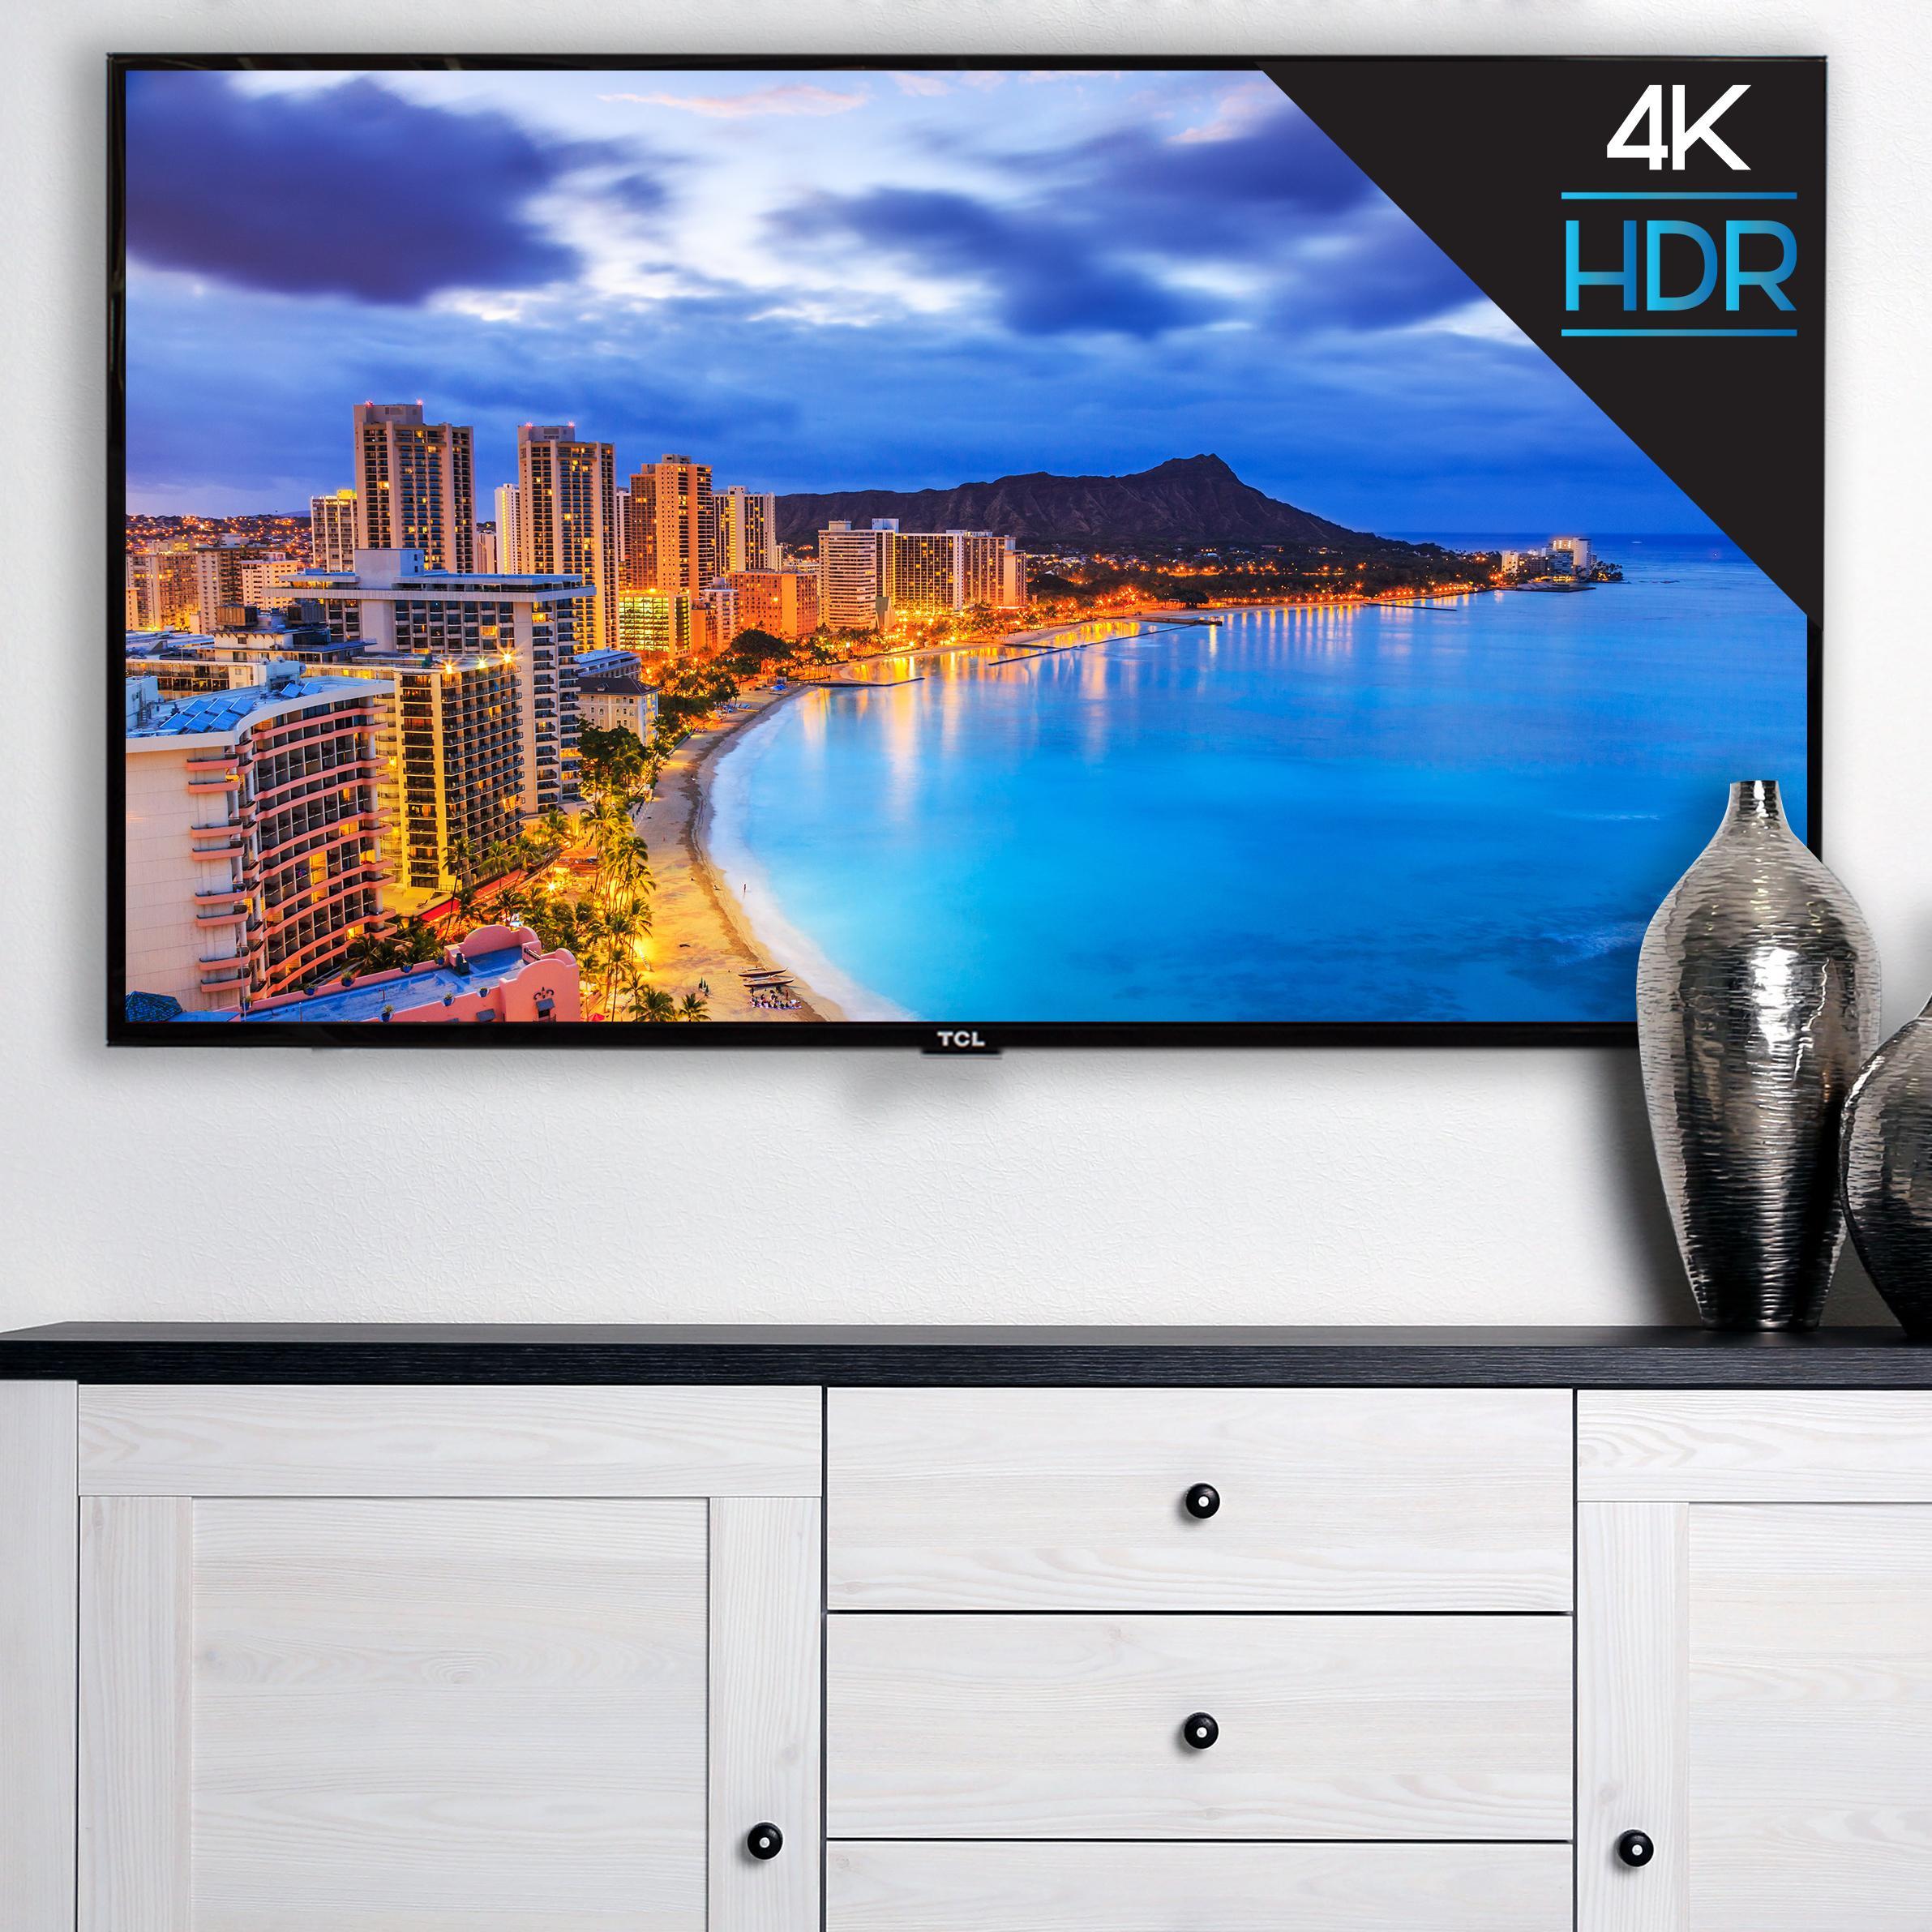 amazon com tcl 55s405 55 inch 4k ultra hd roku smart led tv 2017